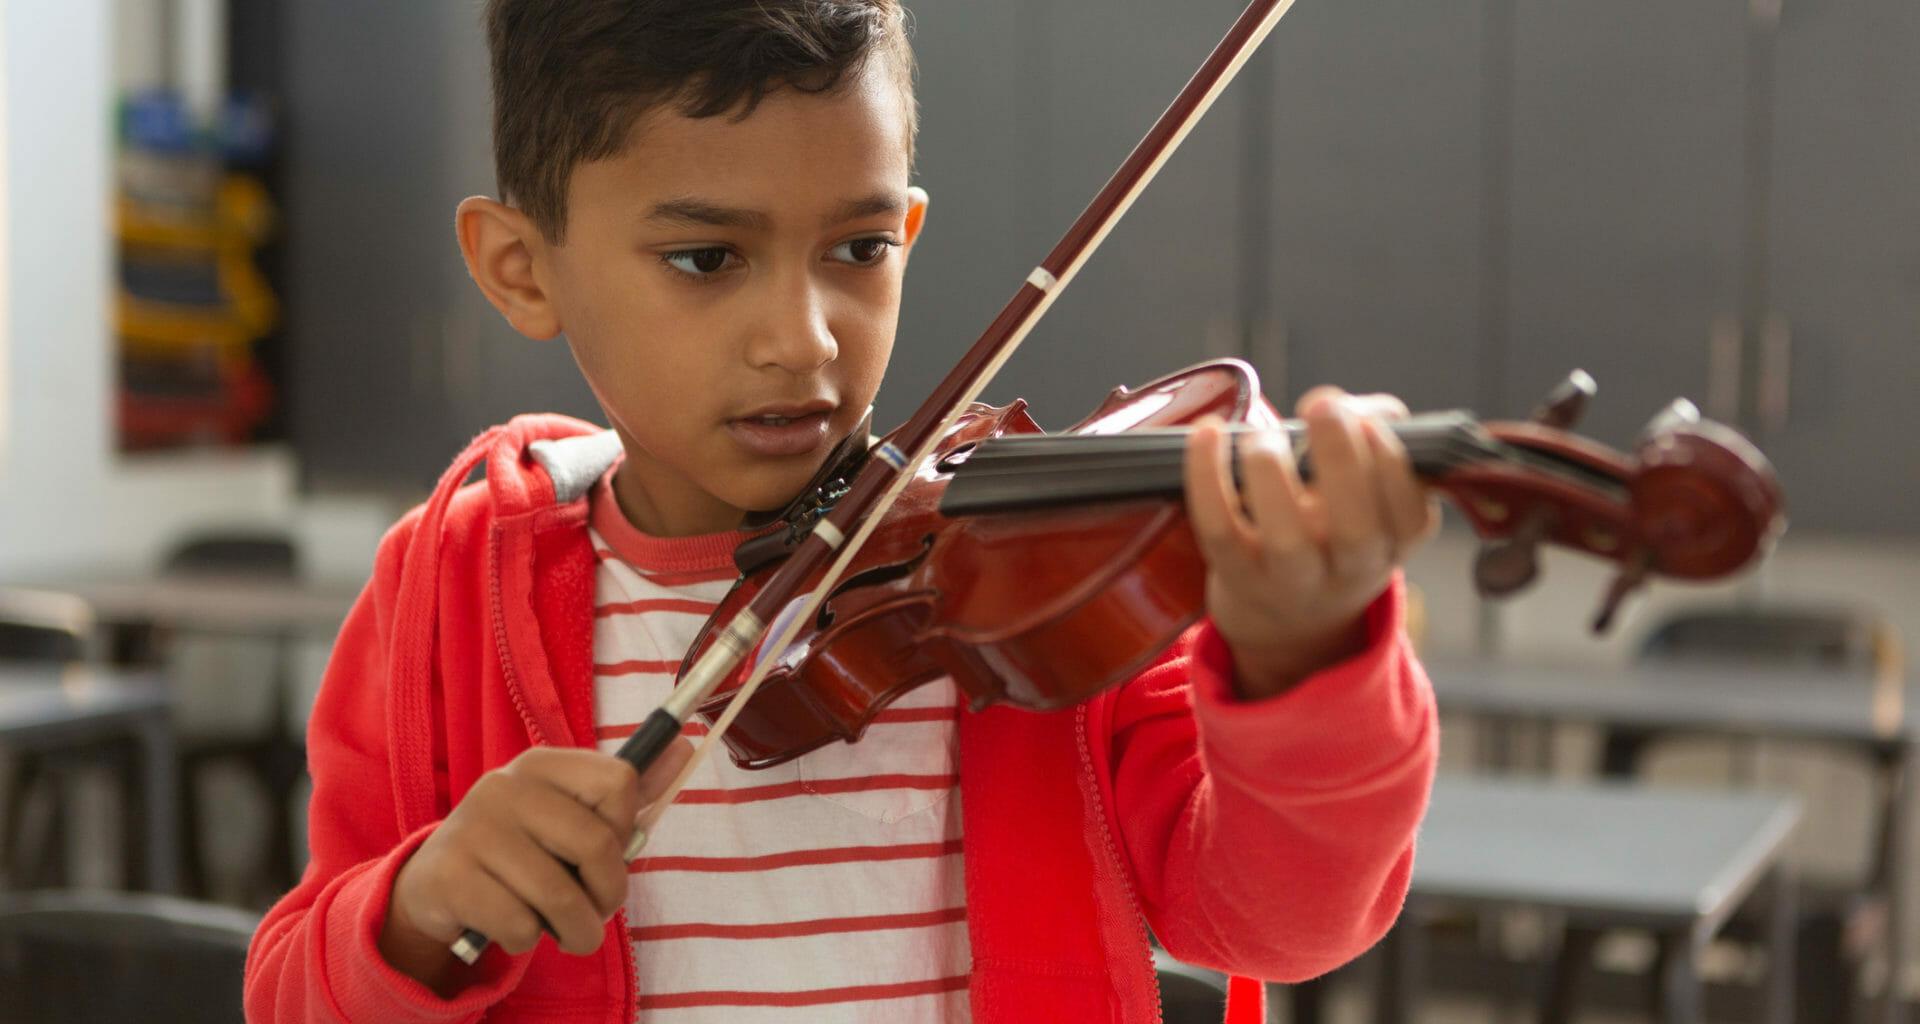 Music lessons under threat